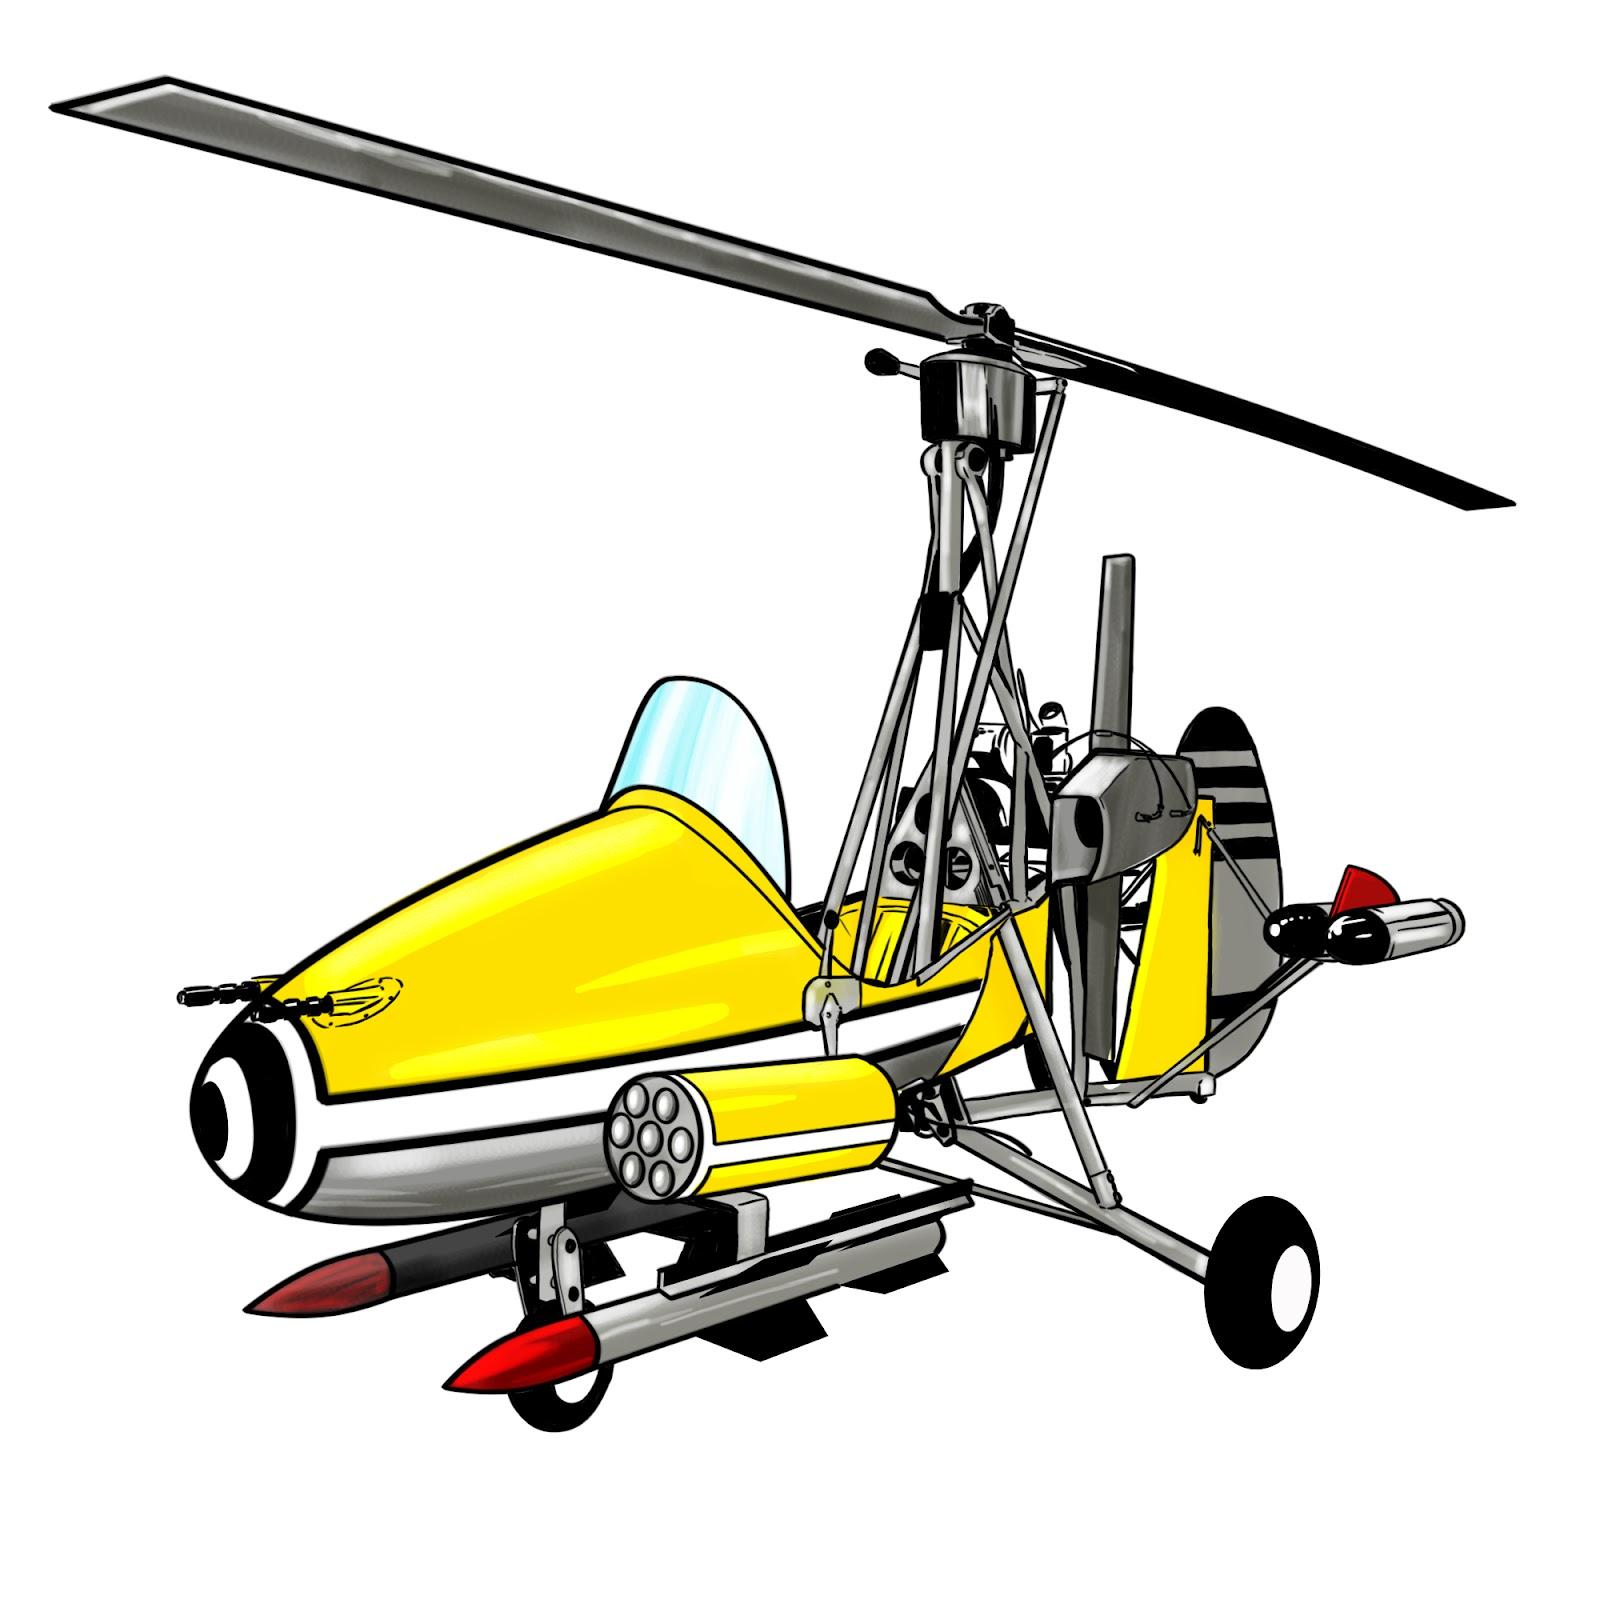 Elicottero Monoposto : Pieffrart iphone app mr bond nuovo livello